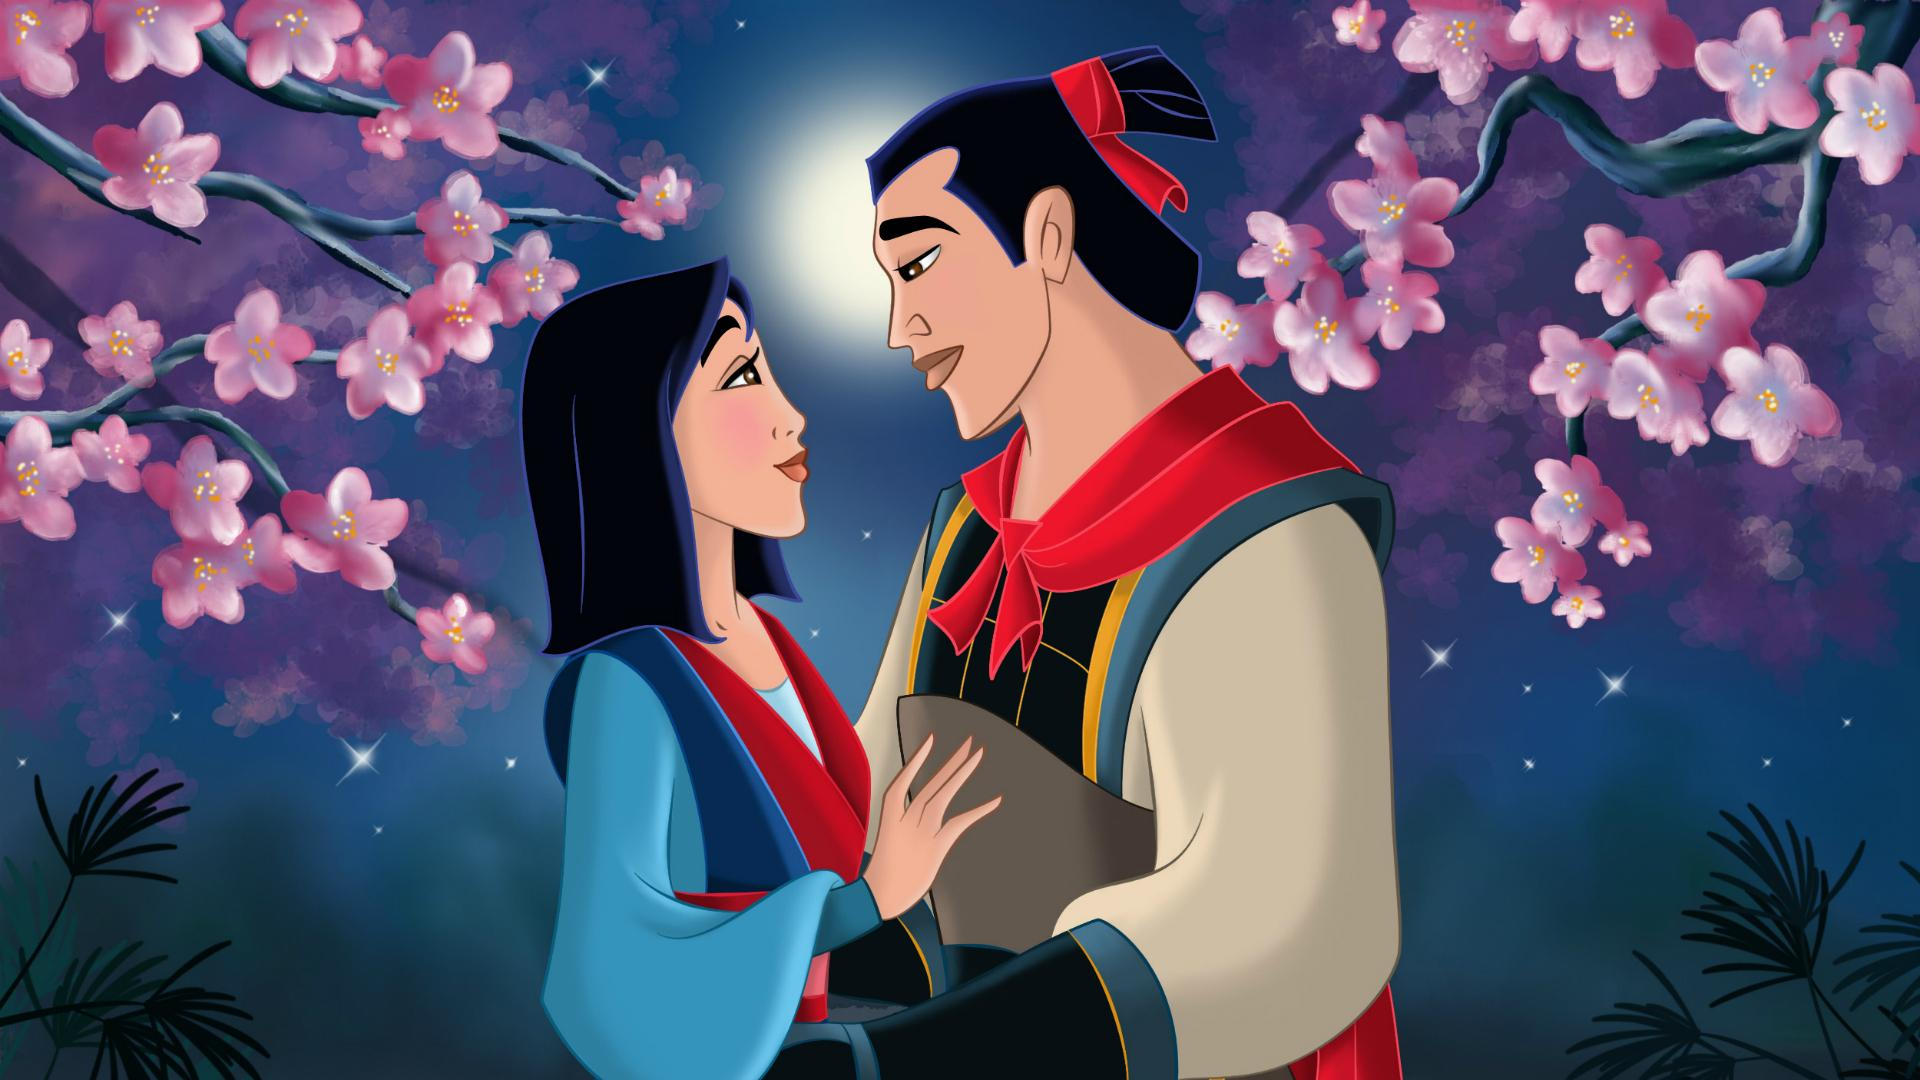 Mulan Wallpapers Top Free Mulan Backgrounds Wallpaperaccess